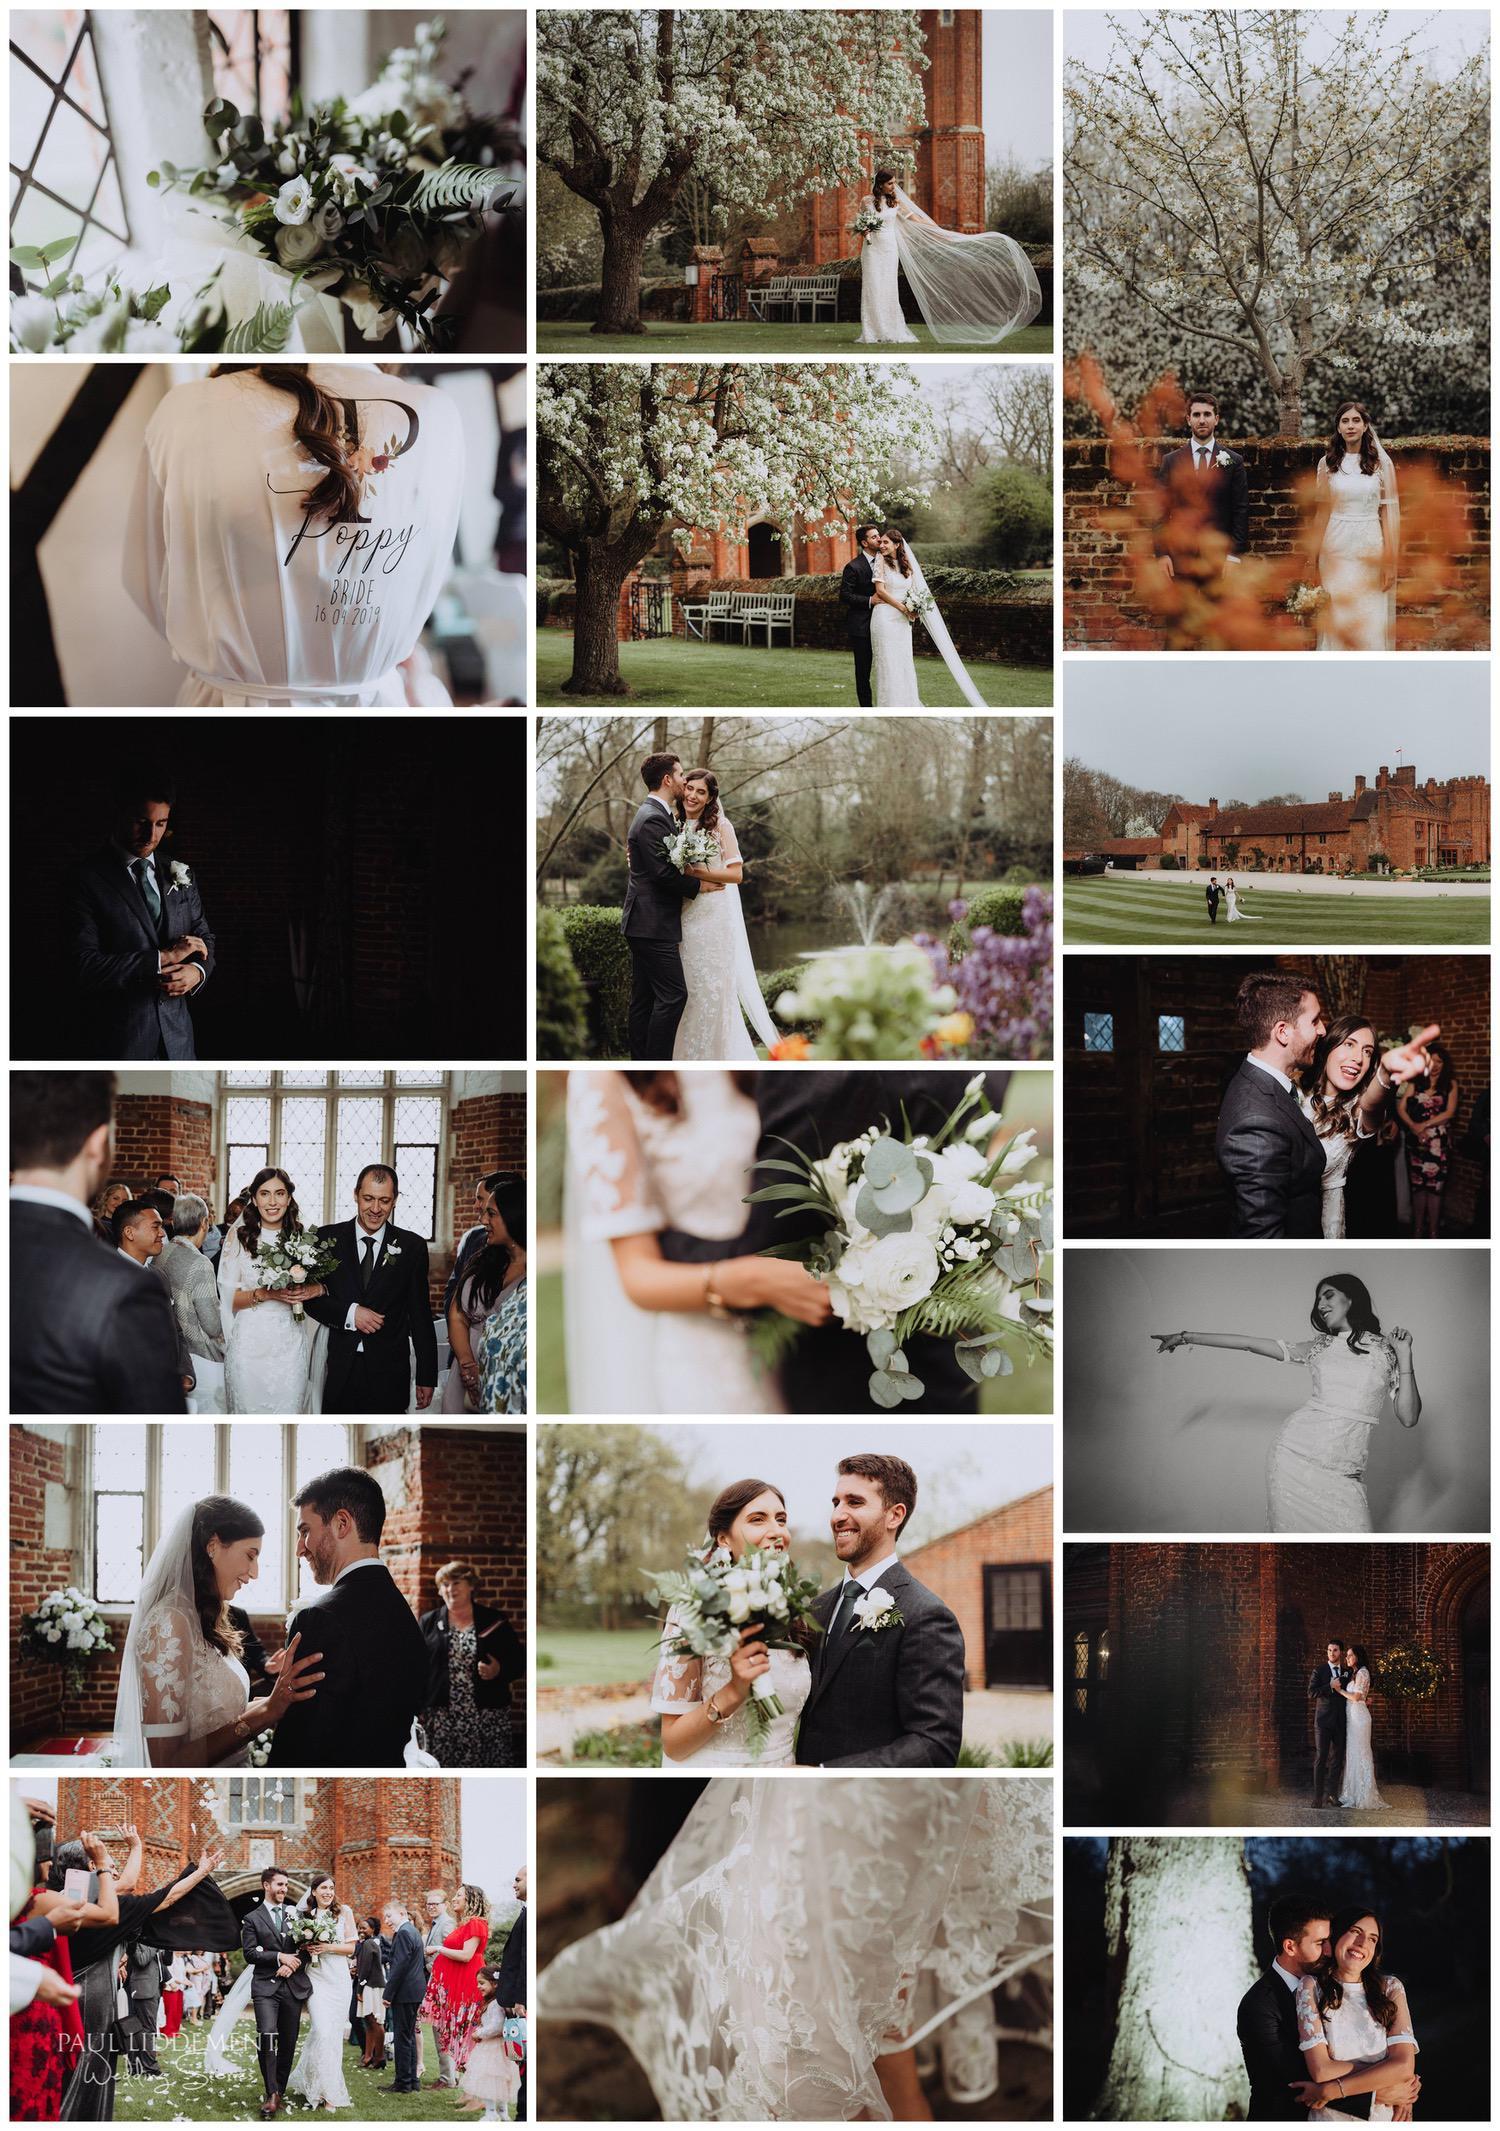 Leez-Priory-Wedding-Photos-Paul-Liddement.jpg